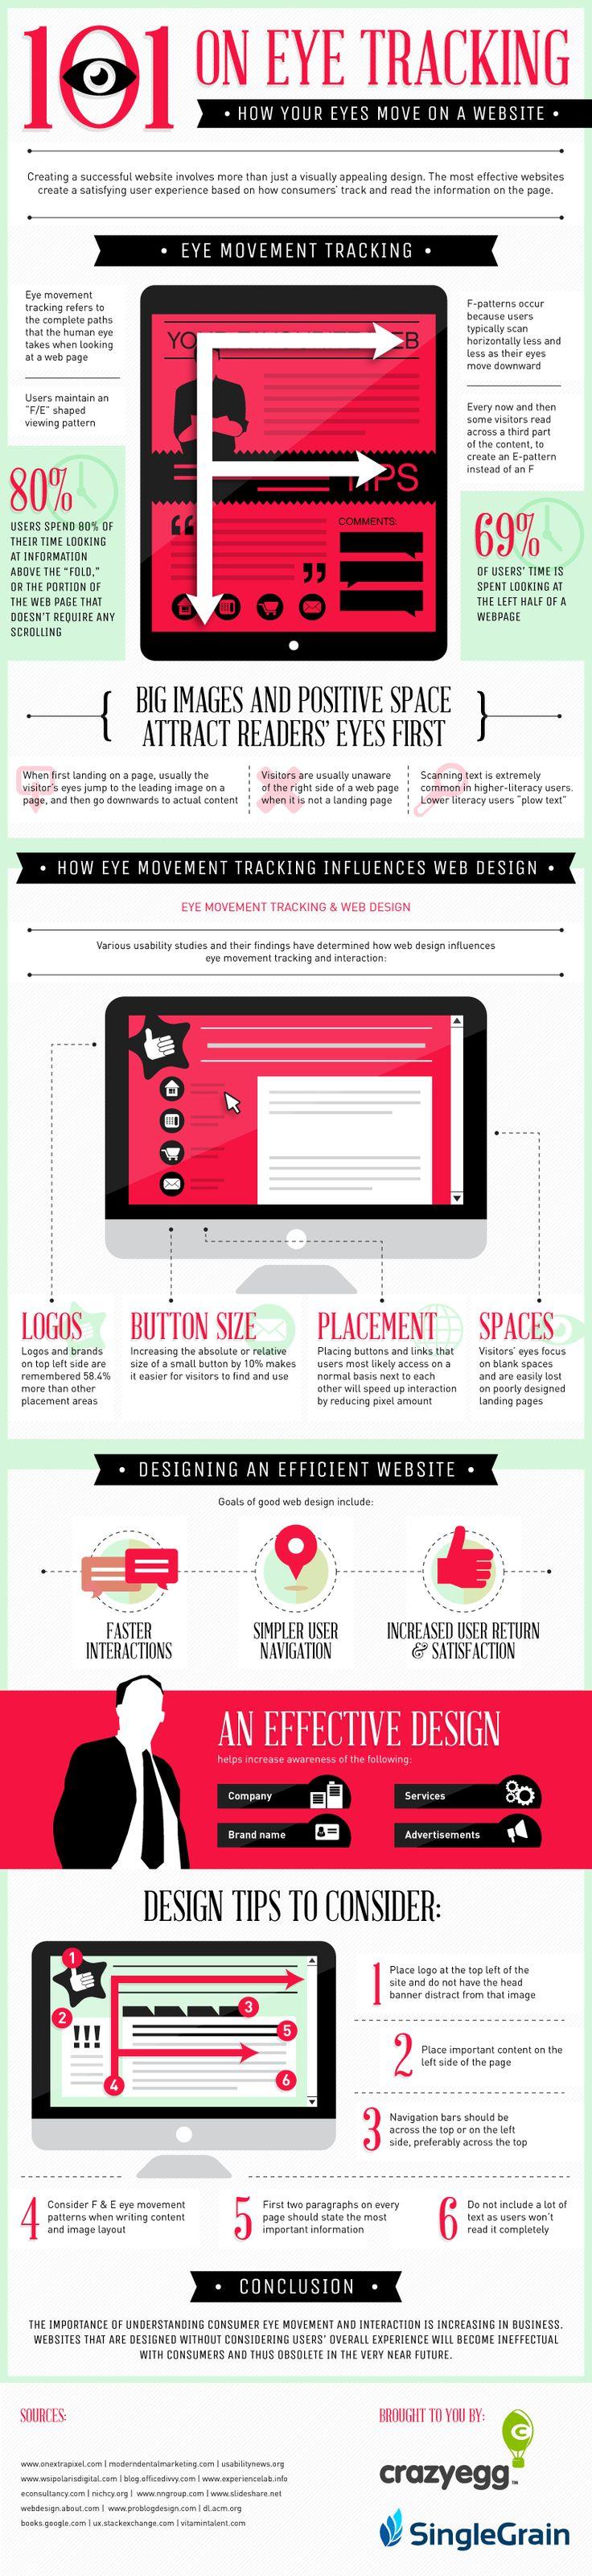 "How the design principle of ""direction"" will help you improve your website design and flow.  #website #design #program"